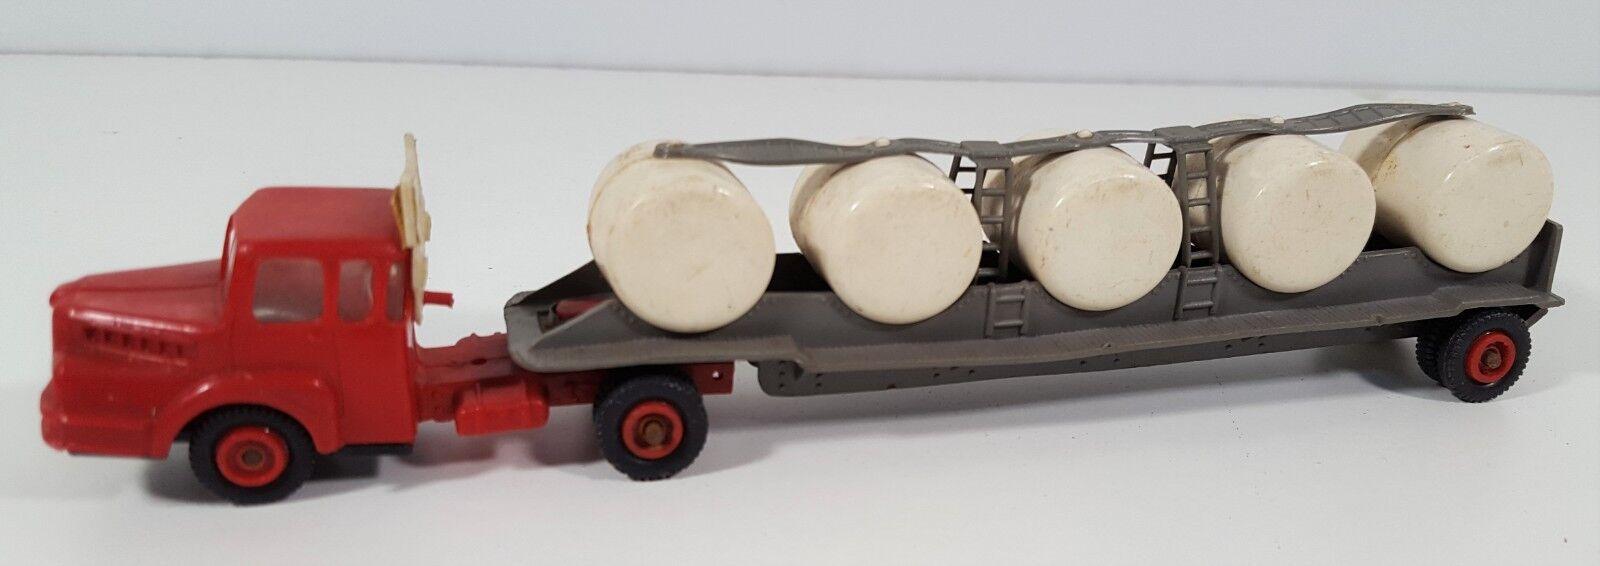 Milk transport mini resin. cars. esc 1 88. made in spain. circa 1950.